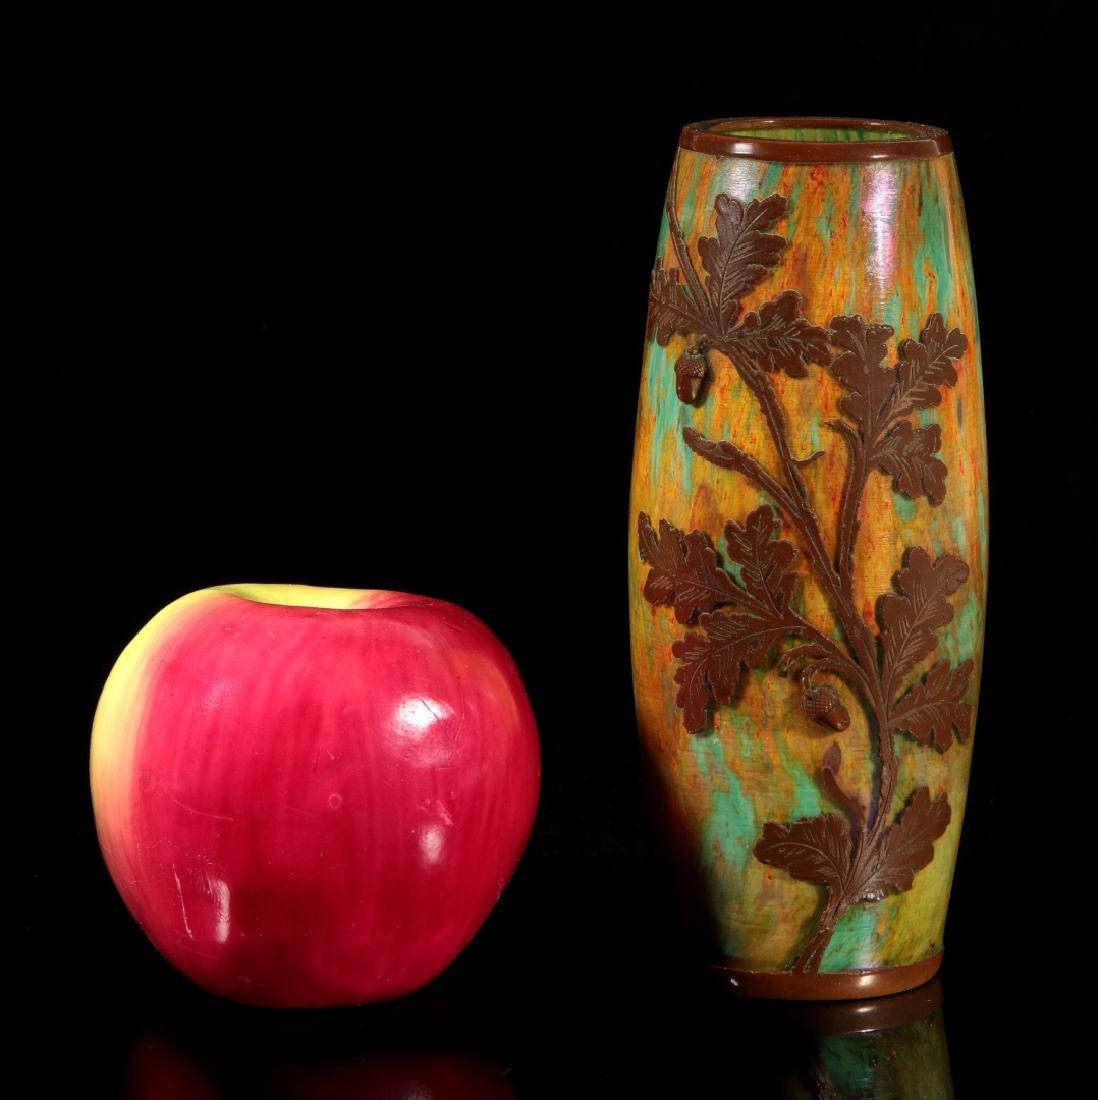 AUSTRIAN(?) ART GLASS VASE CLAD IN ENGRAVED COPPER - 2